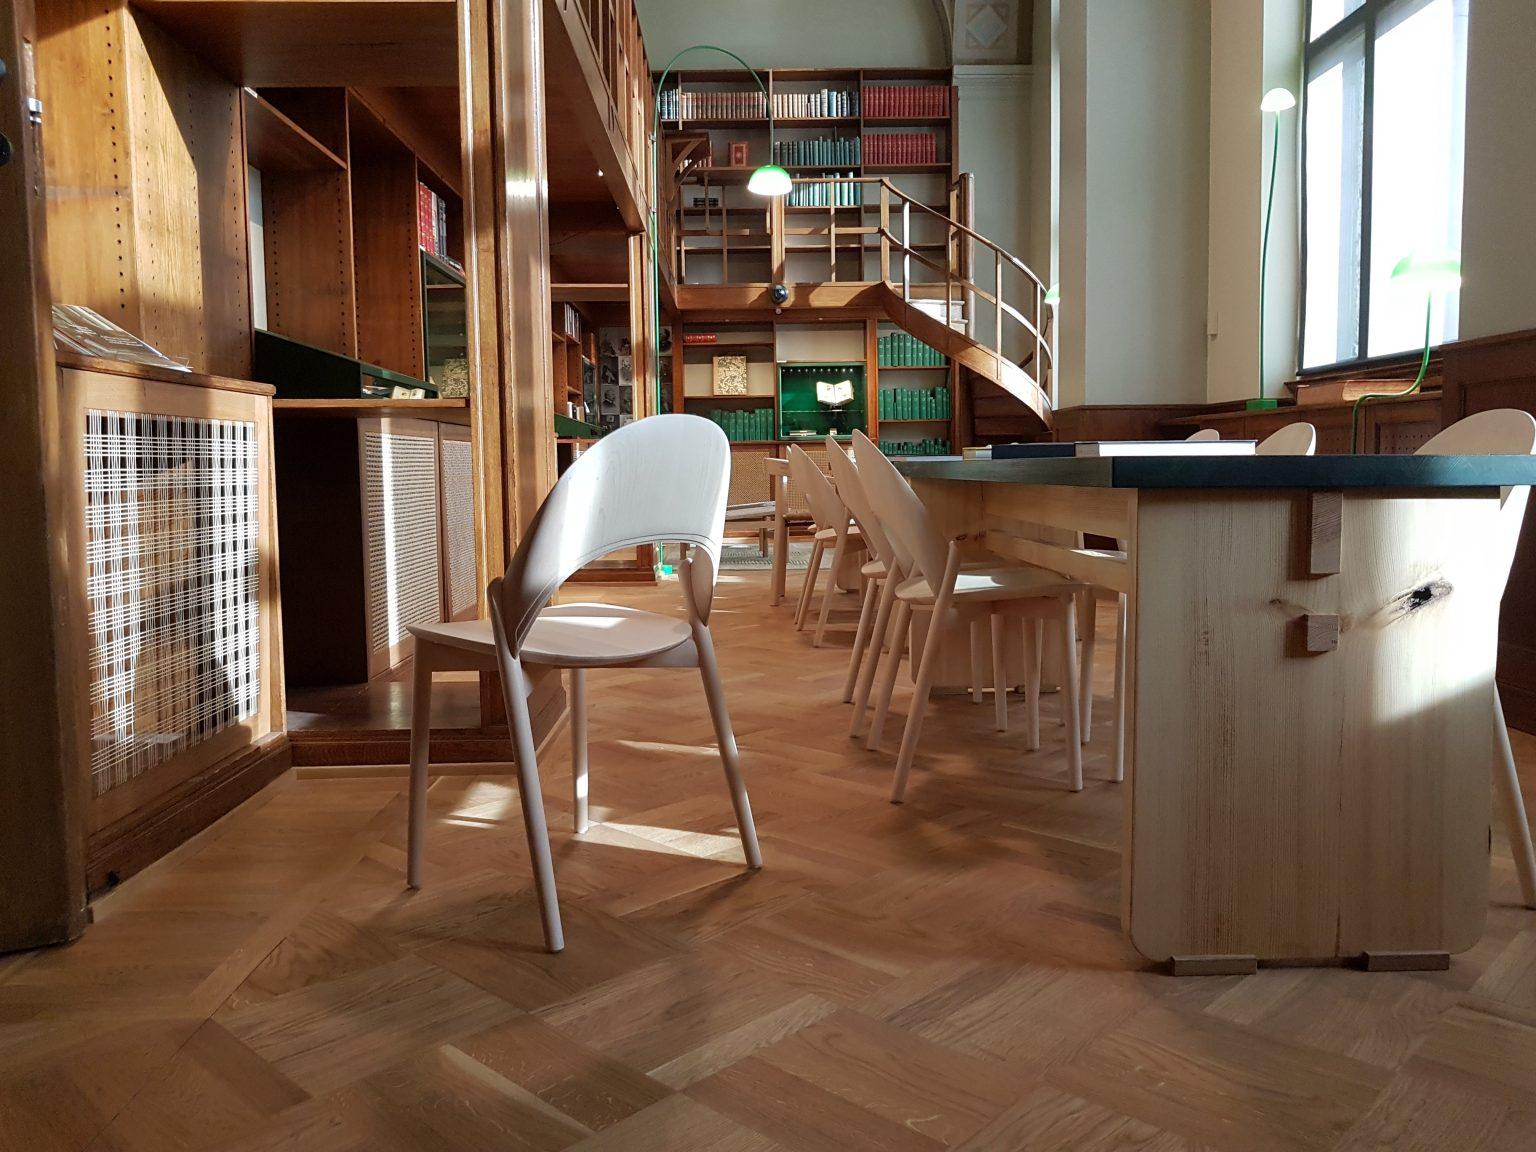 Biennale Interieur - Belgium's leading design and interior event - National-museum-4.jpg